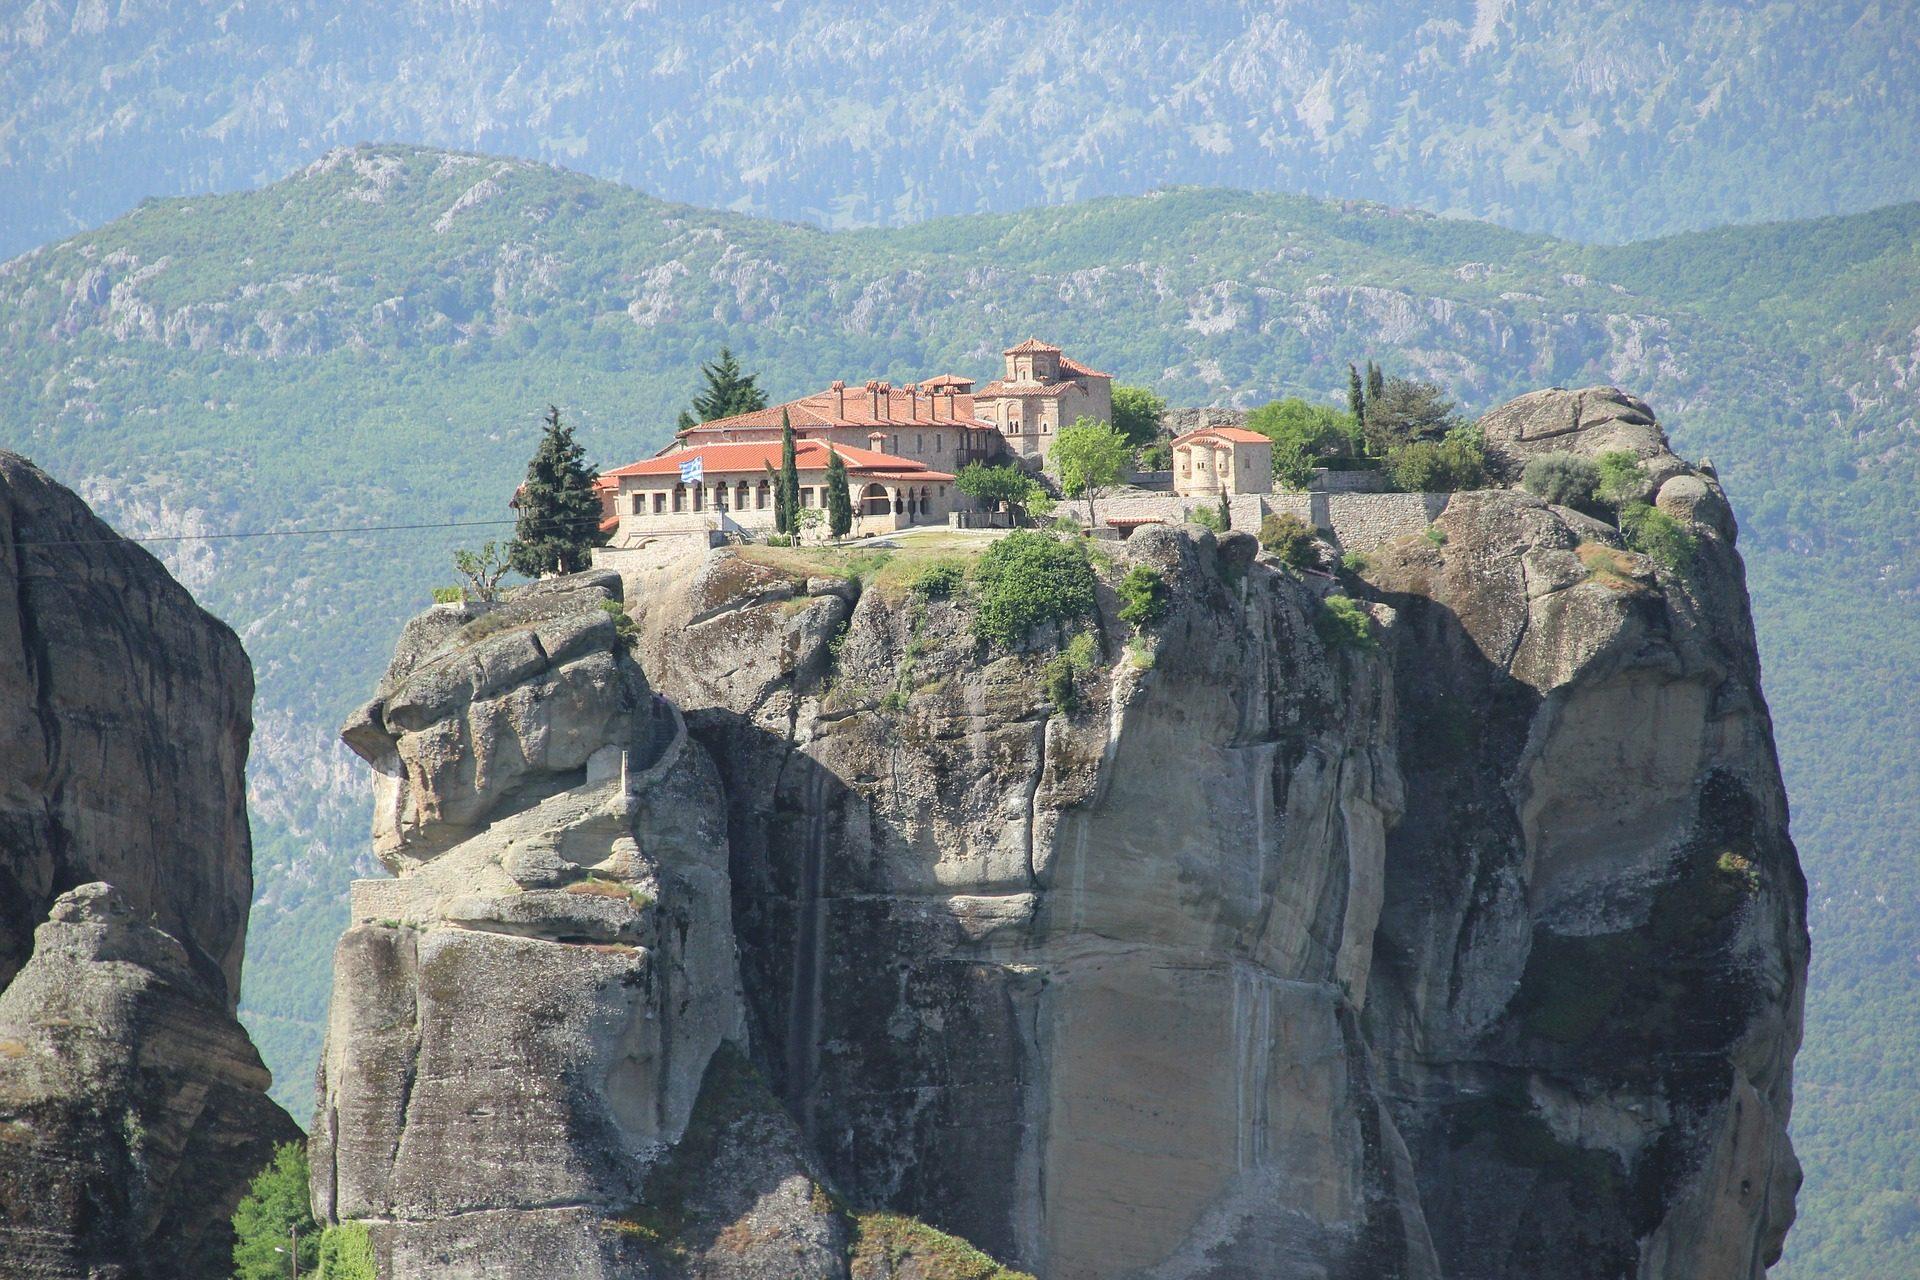 monasterio, ページのトップへ, ロカ, 山, meteora, ギリシャ - HD の壁紙 - 教授-falken.com